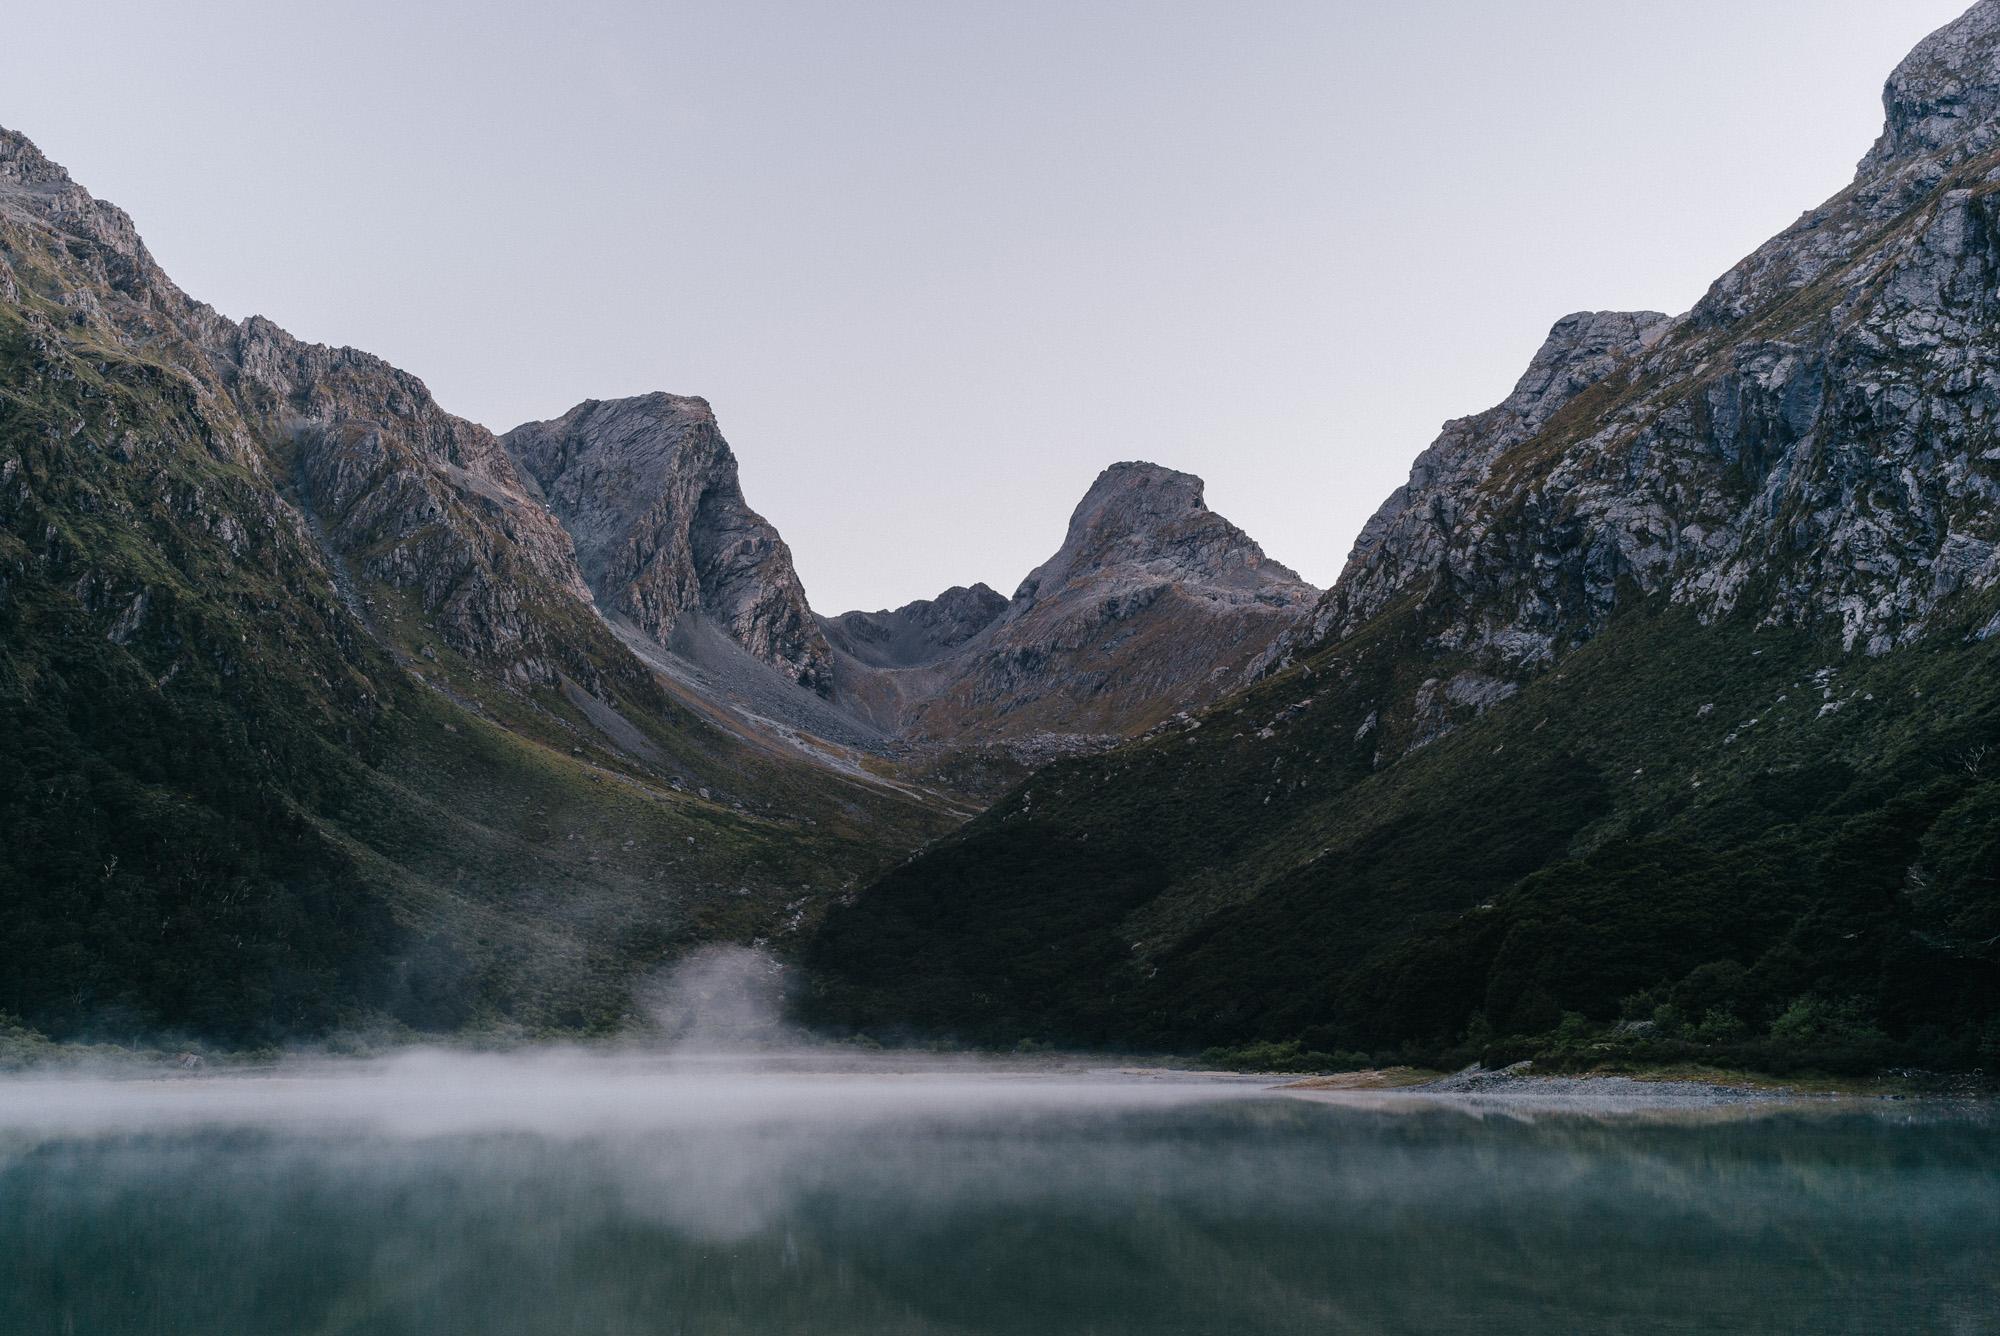 Emily Peak over Lake Mackenzie, New Zealand